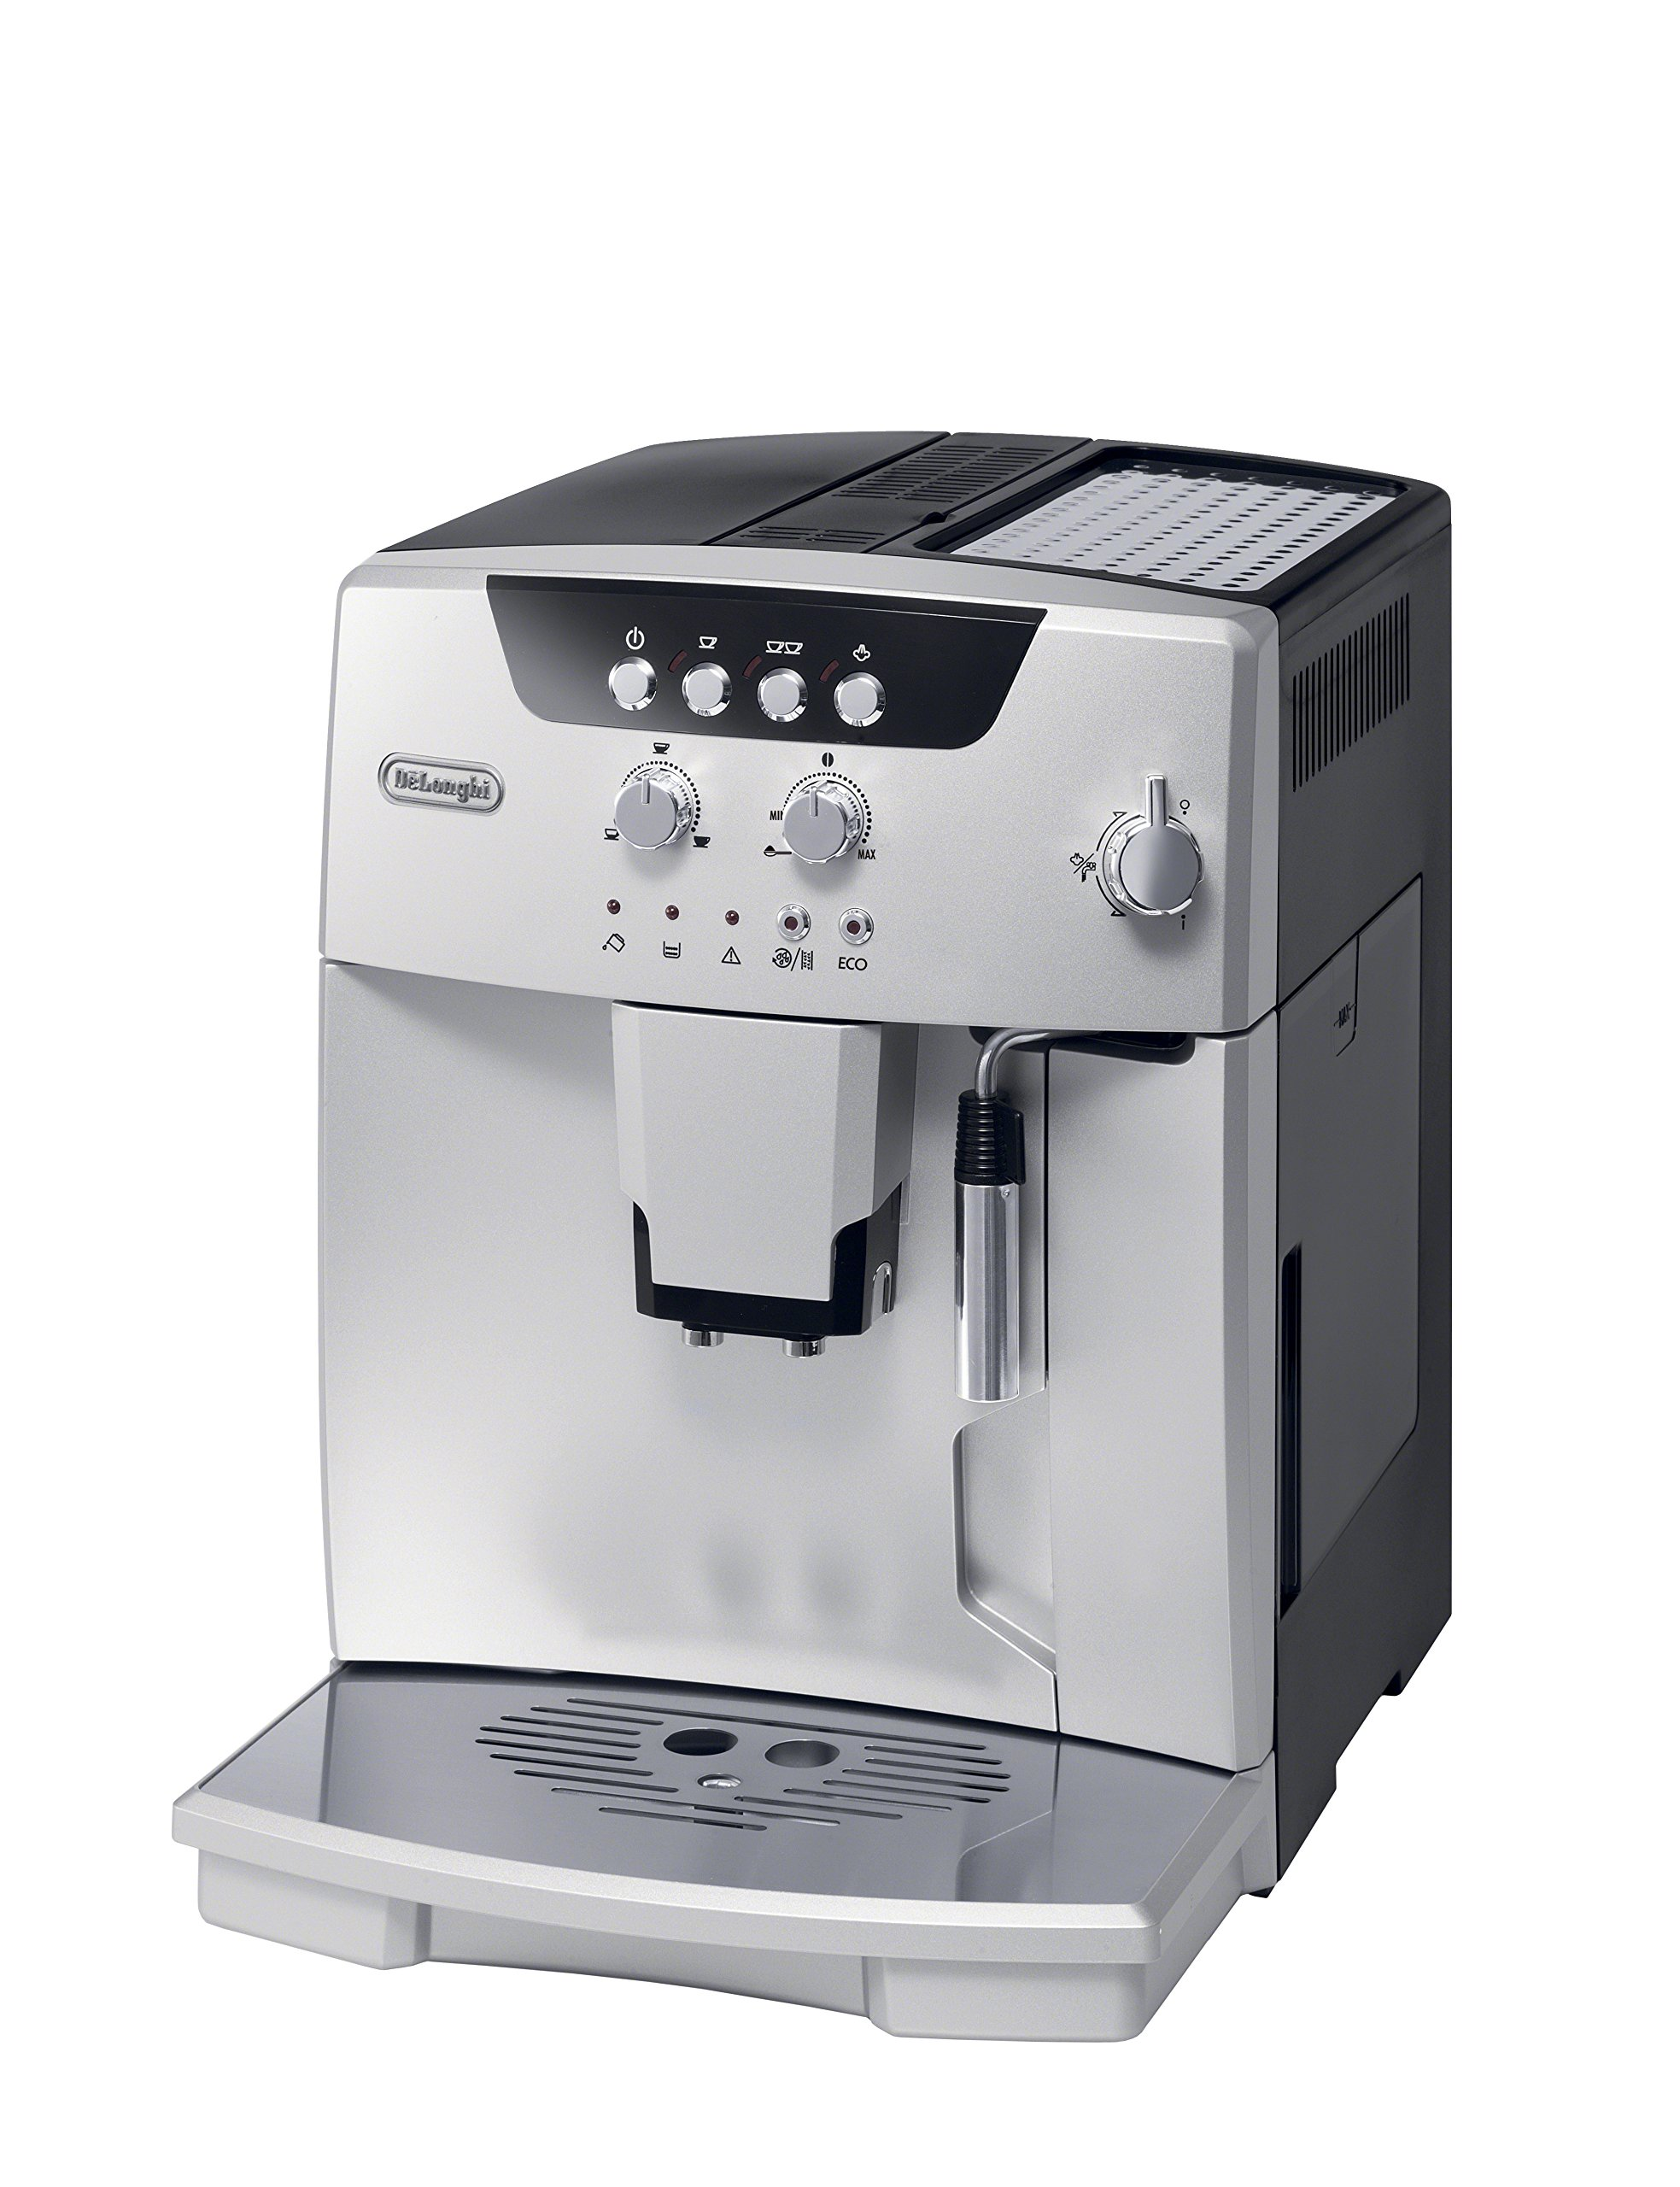 De'Longhi ESAM04110S Magnifica Fully Automatic Espresso Machine with Manual Cappuccino System, Silver by De'Longhi